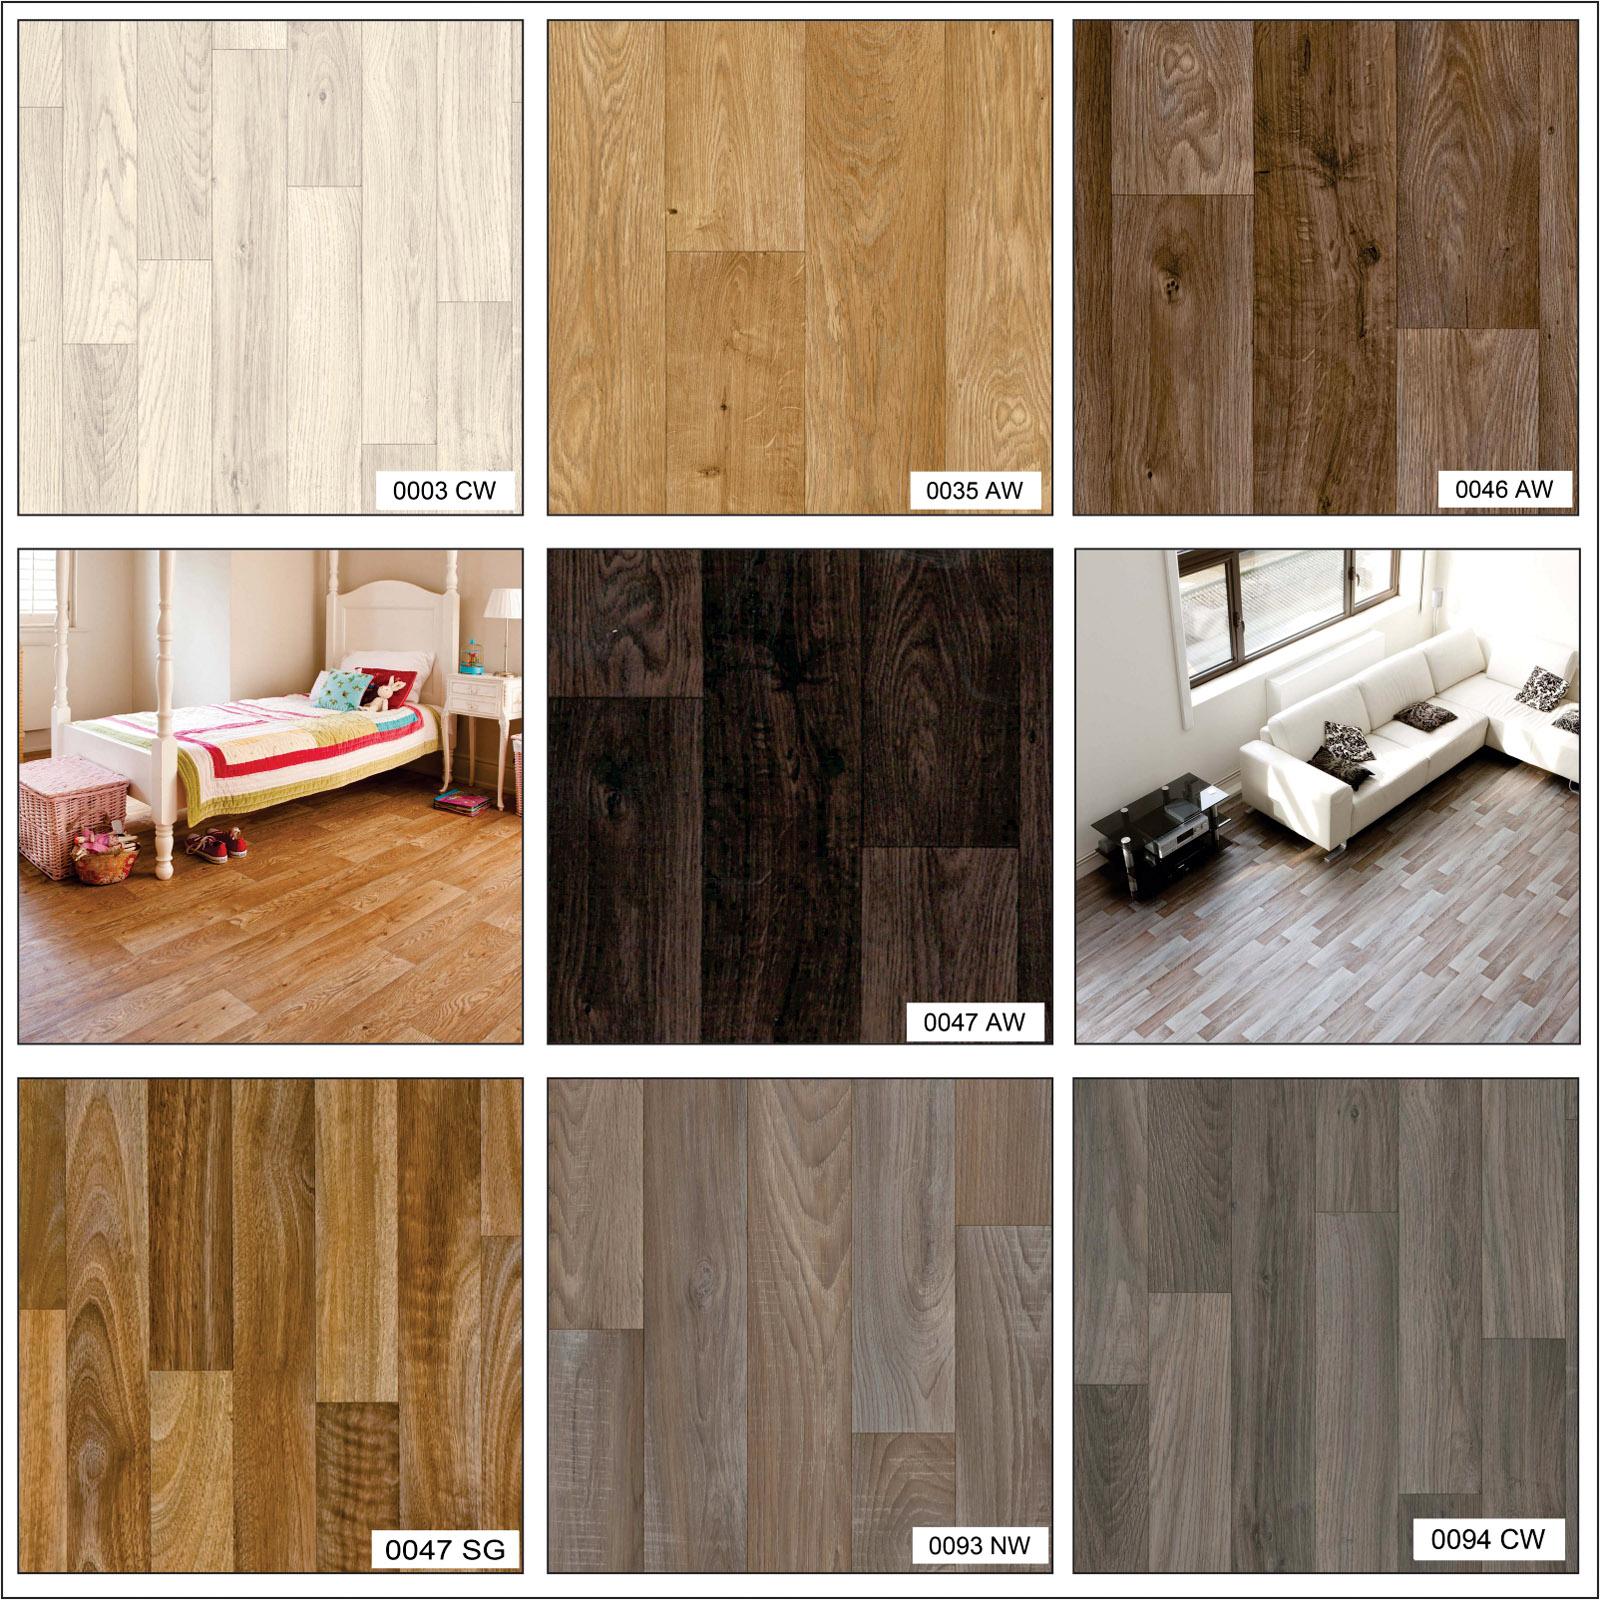 Wood Effect Anti Slip Lino Home Office Kitchen Bedroom Vinyl